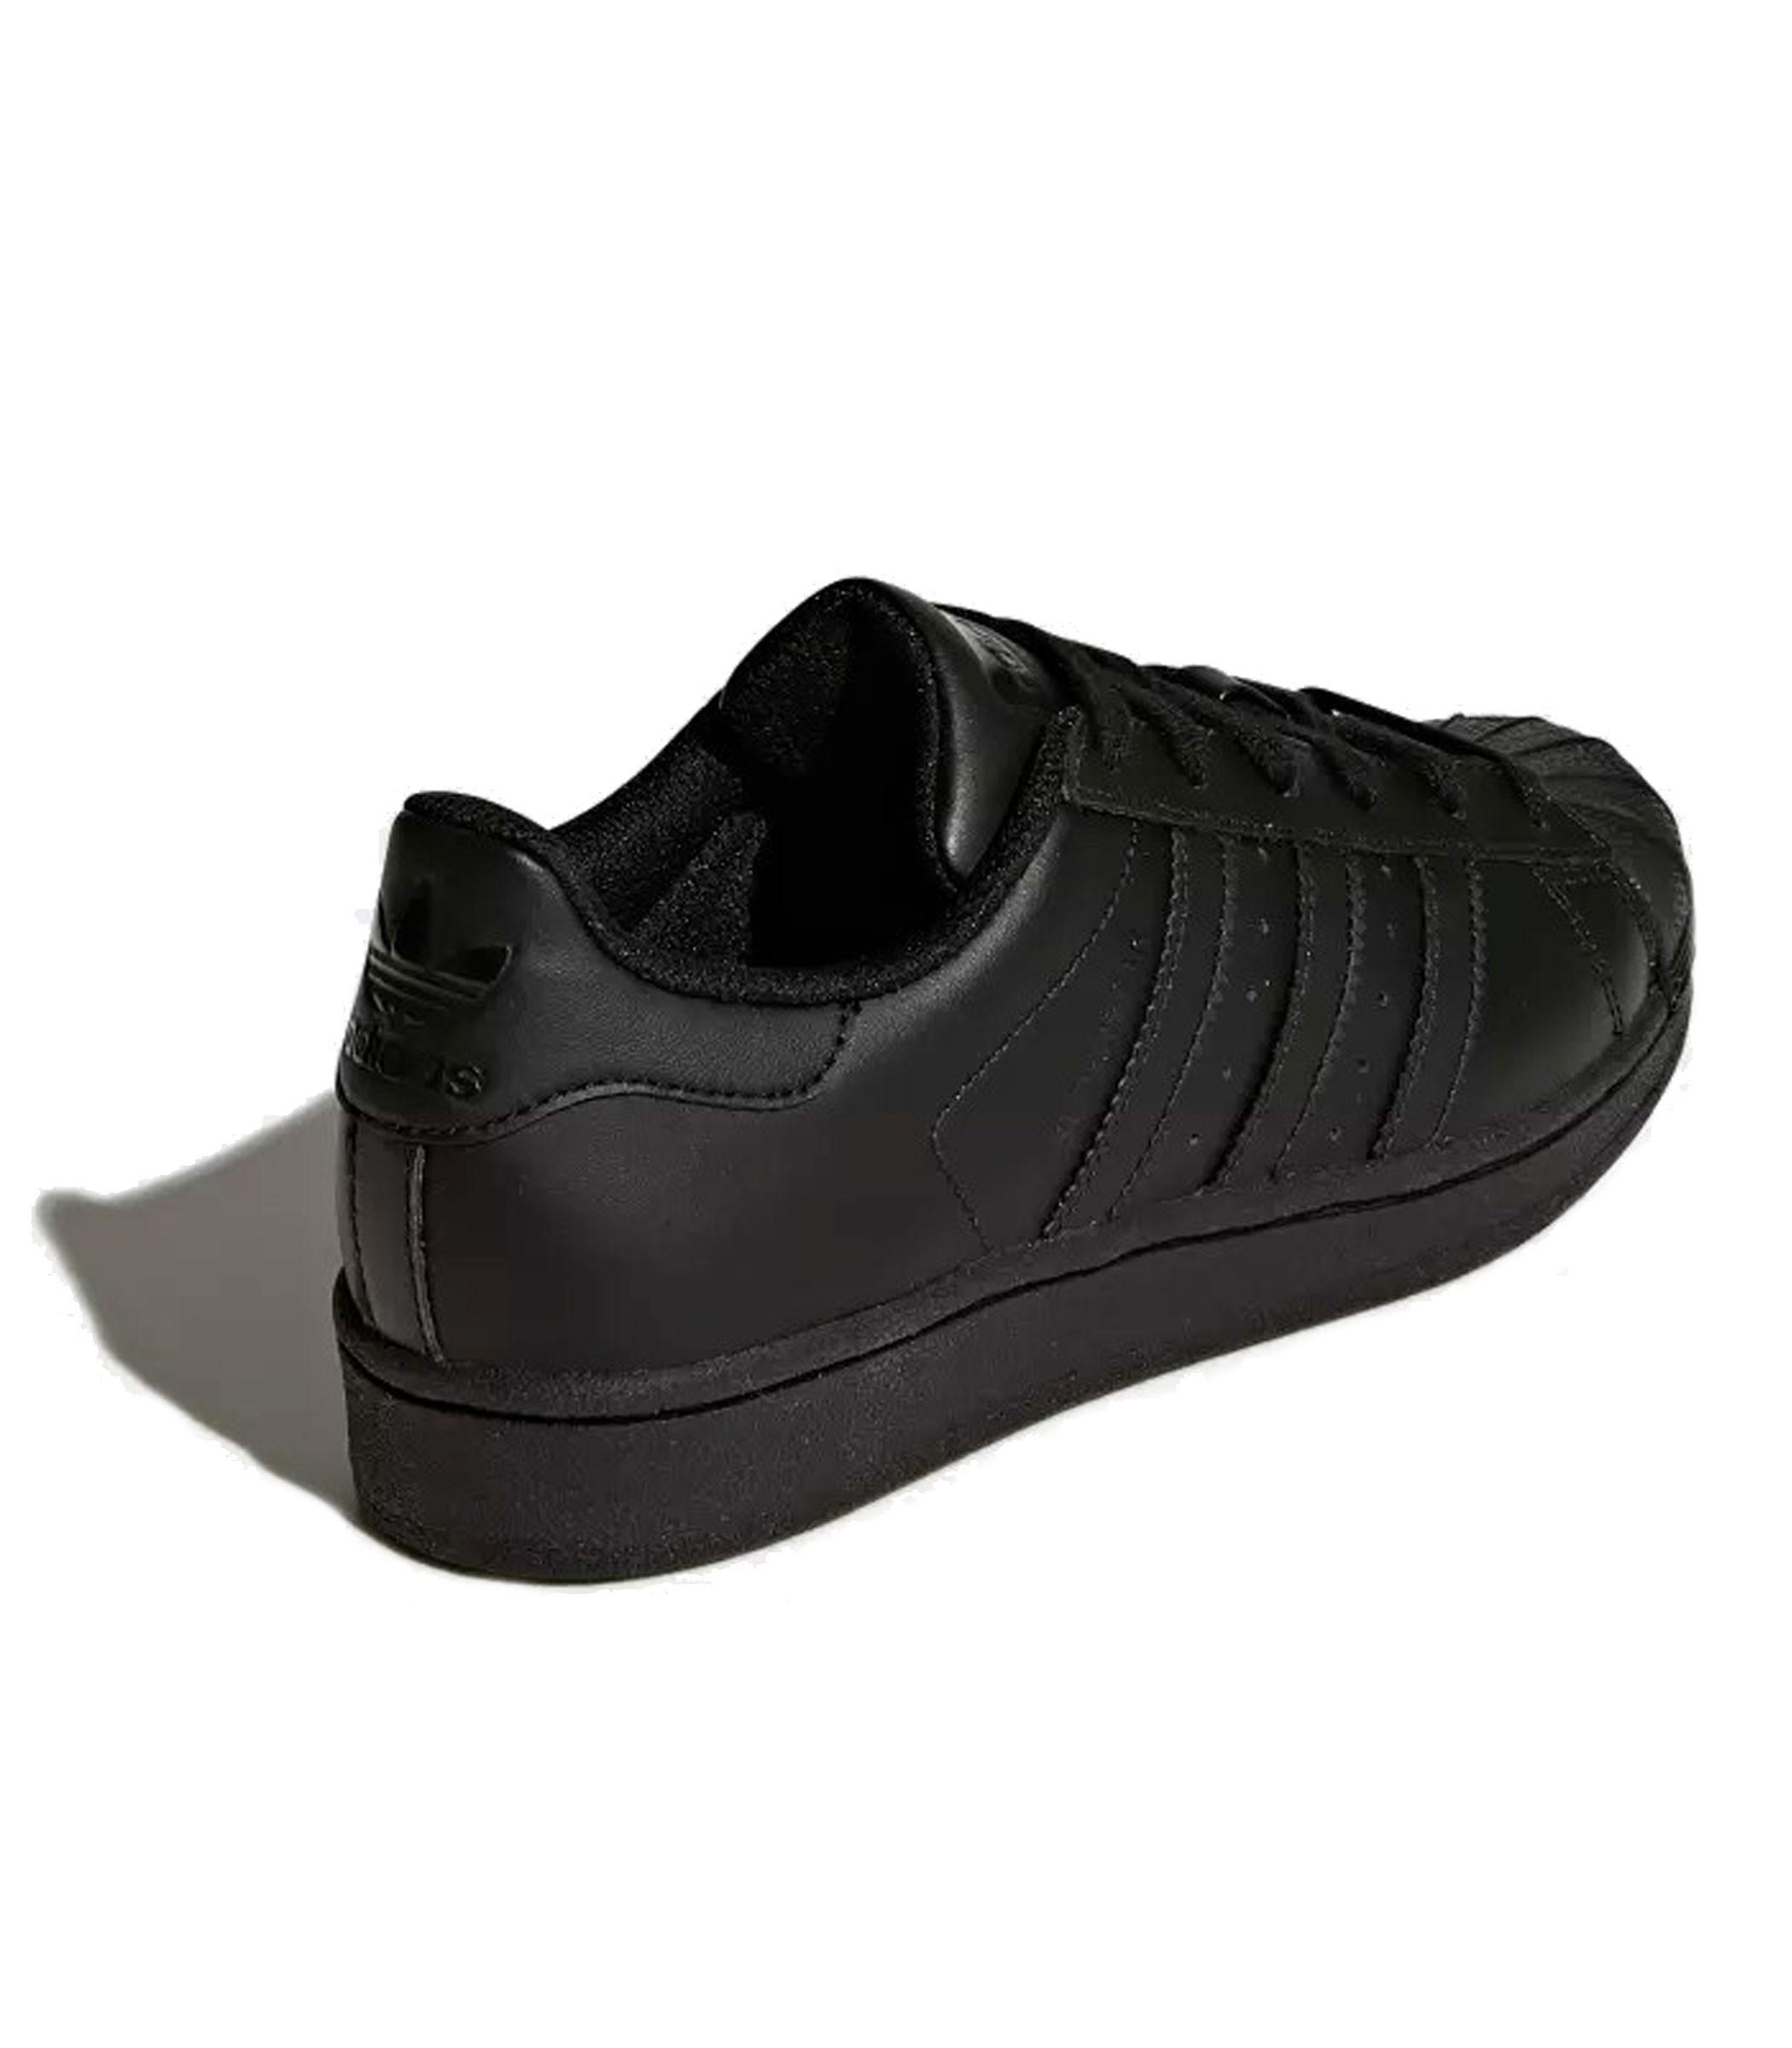 meet 1b37e 592b6 B25724 Scarpe Sneakers Adidas SUPERSTAR FOUNDATION J da ragazzo ragazza rif.